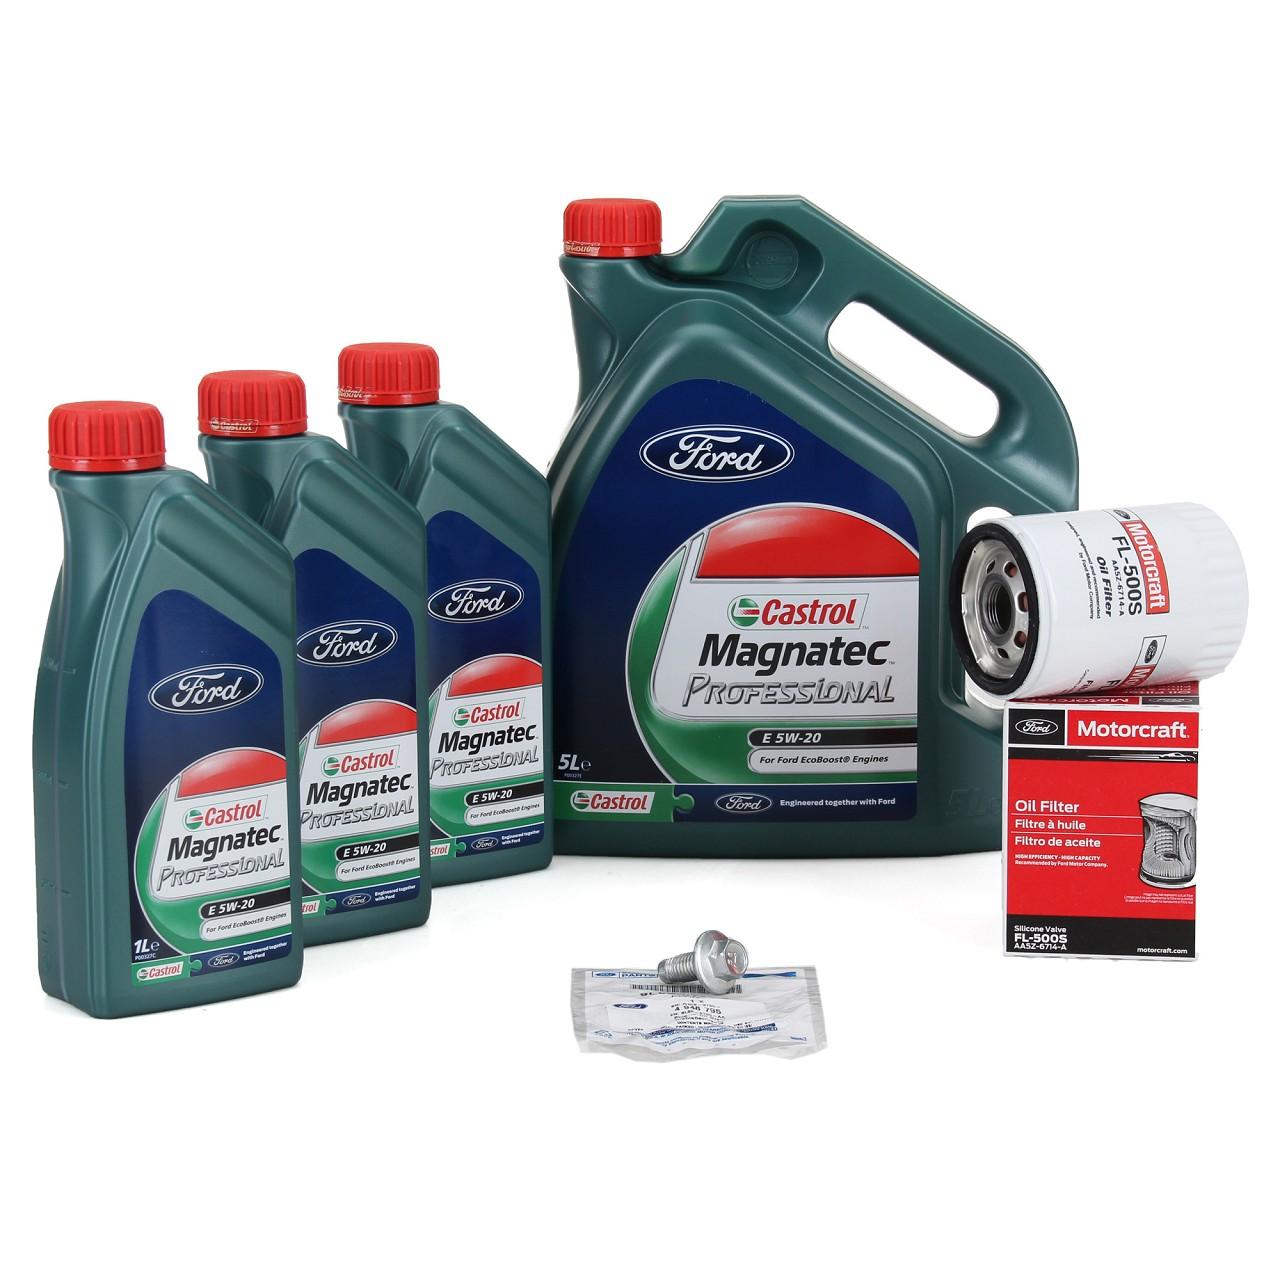 ORIGINAL Ford CASTROL Magnatec Professional E 5W20 + Ölfilter 2081941 Mustang V8